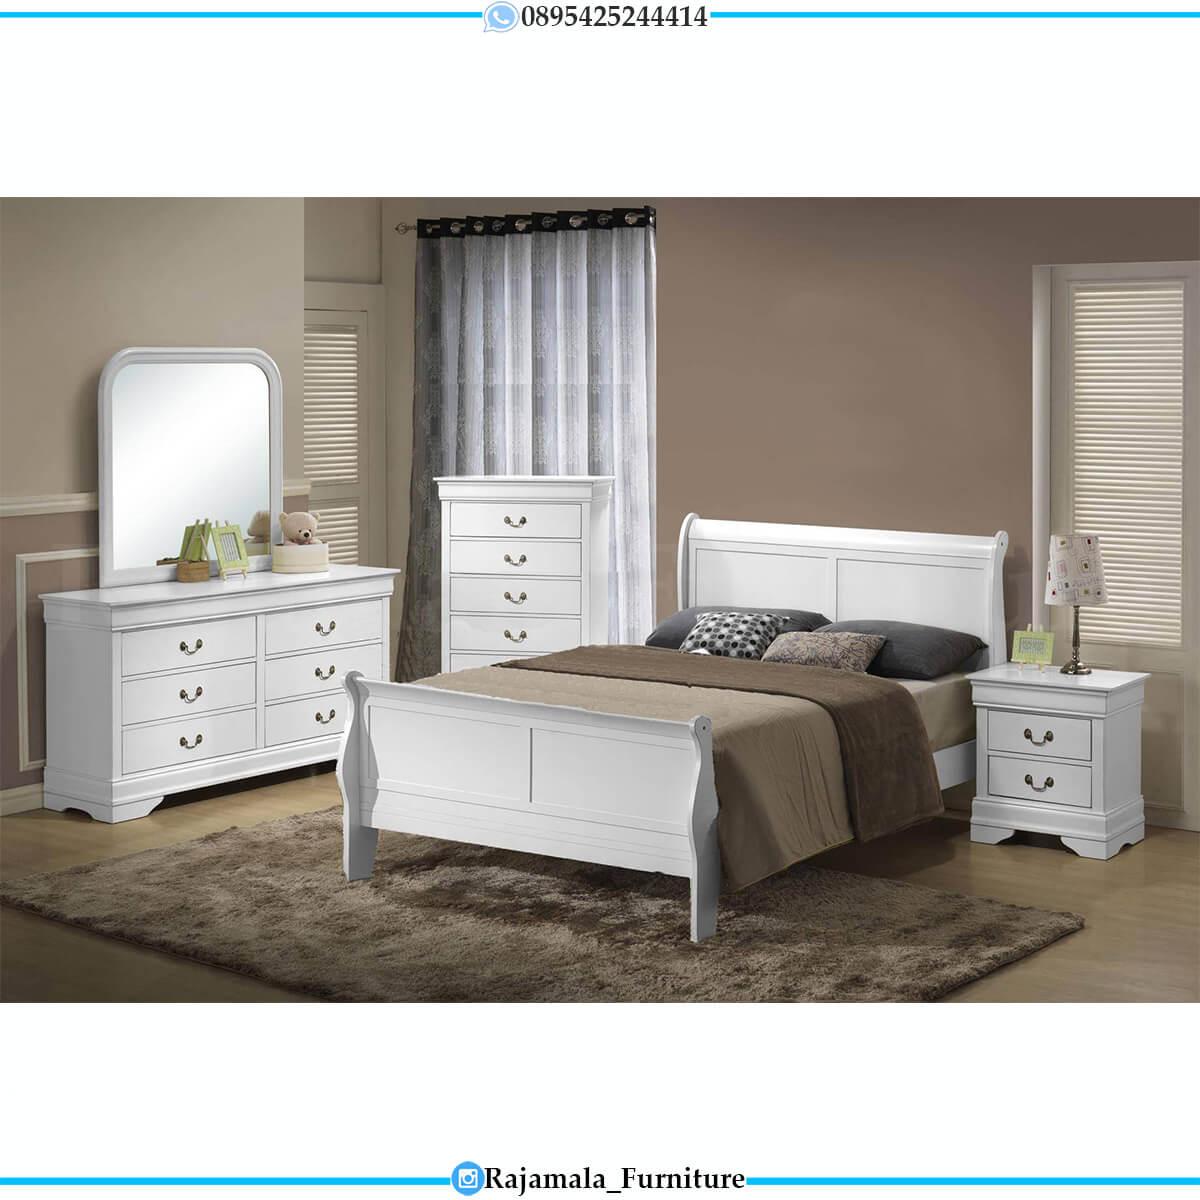 Tempat Tidur Minimalis Putih Duco Elegant Set Design RM-0639